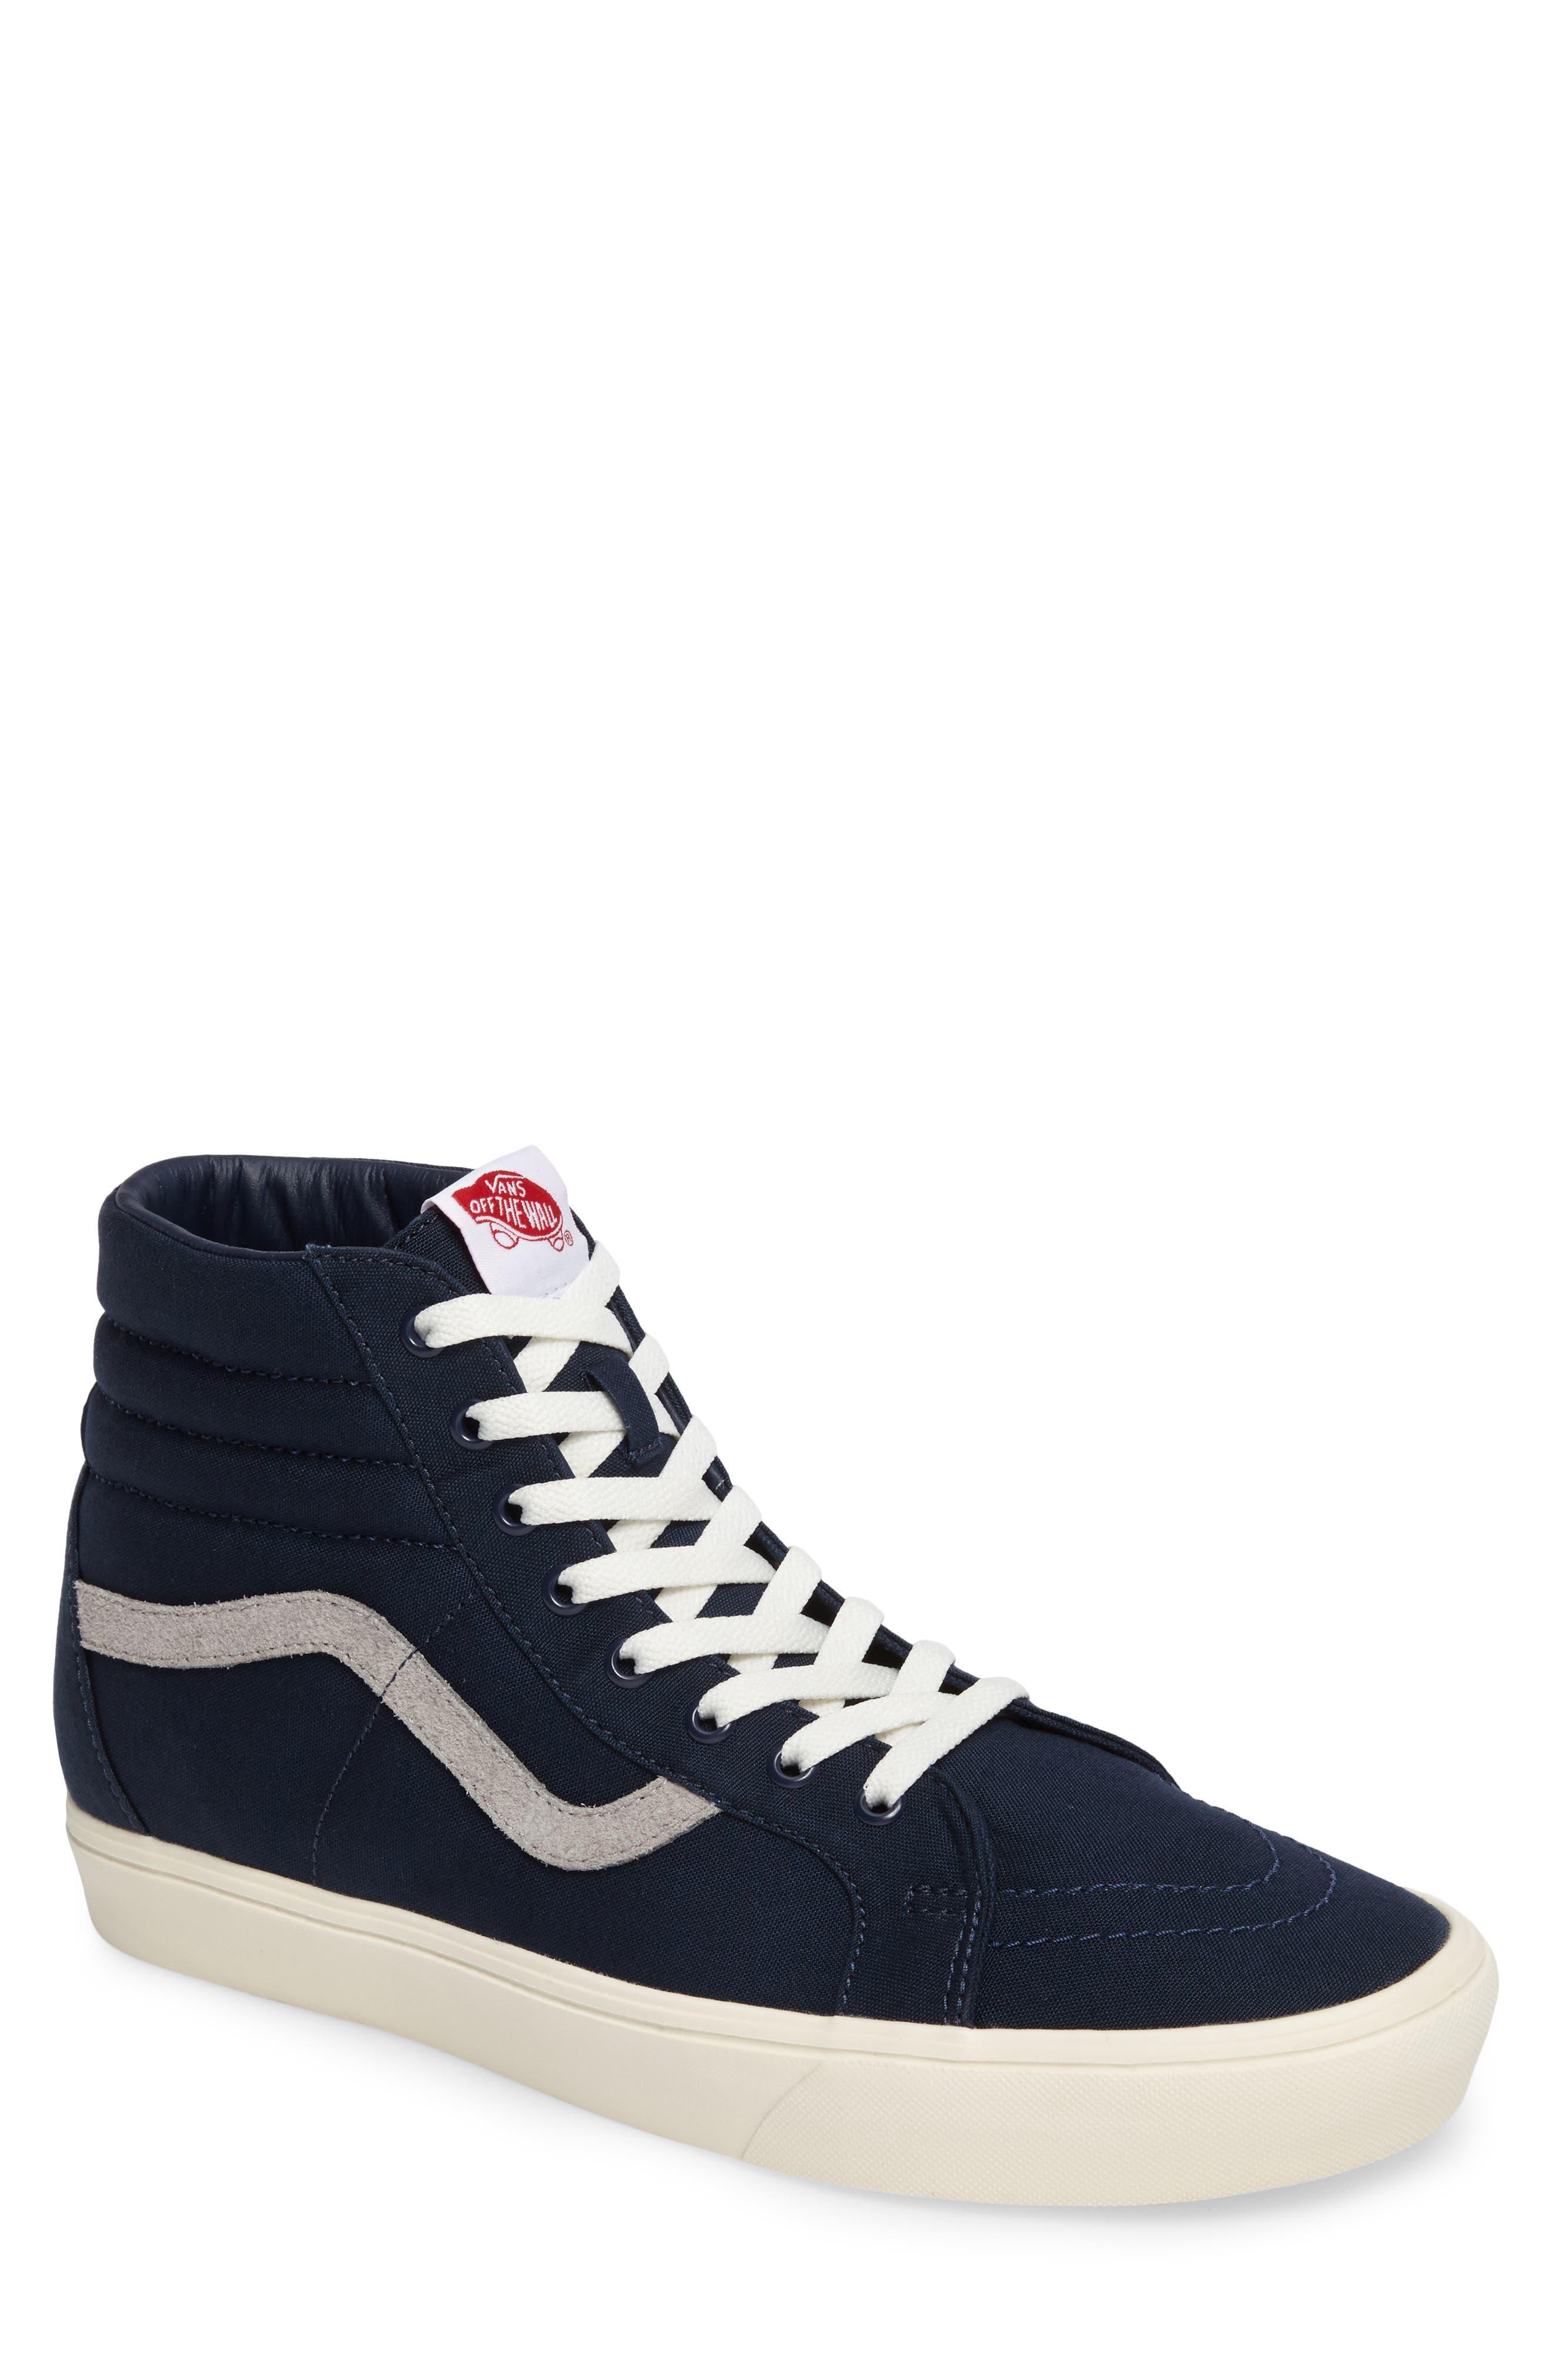 Sk80-Hi Reissue Lite Sneaker,                         Main,                         color, 420